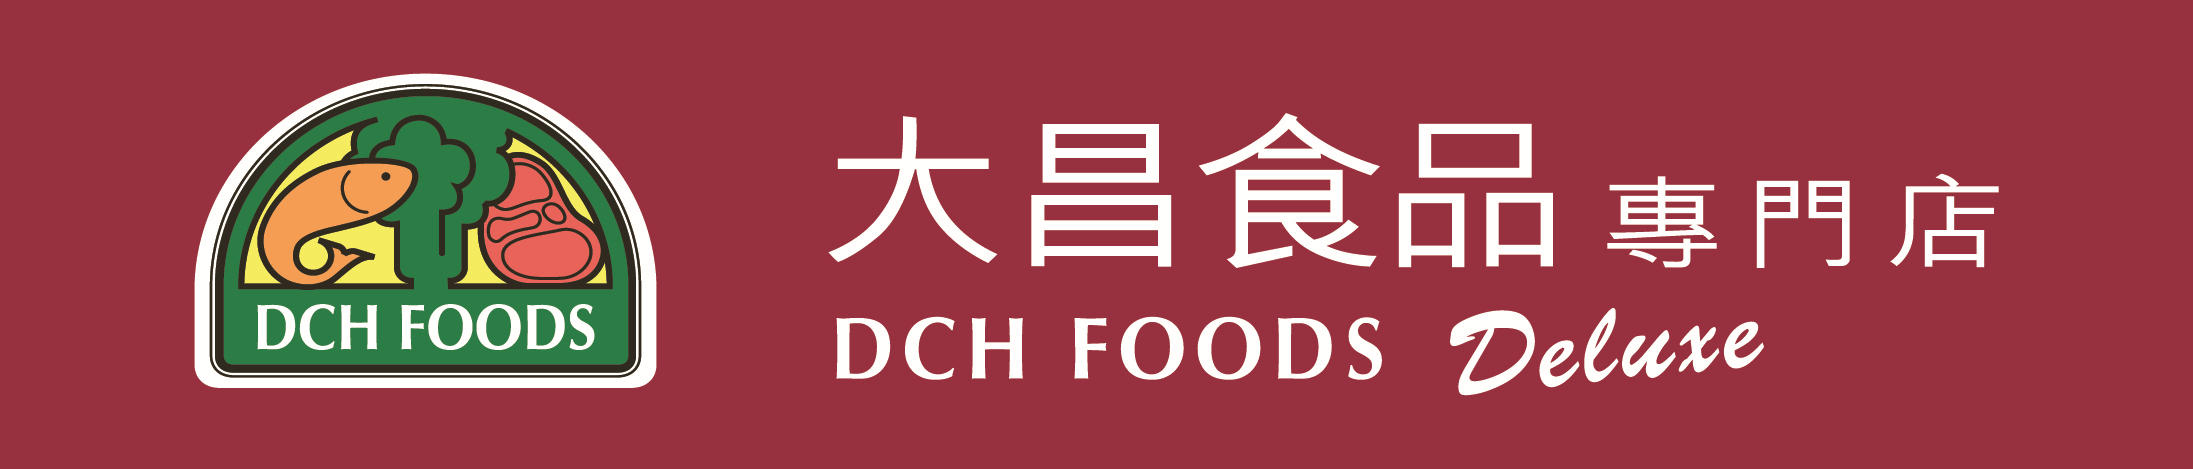 food scheme 2019 gold DCH FoodMart